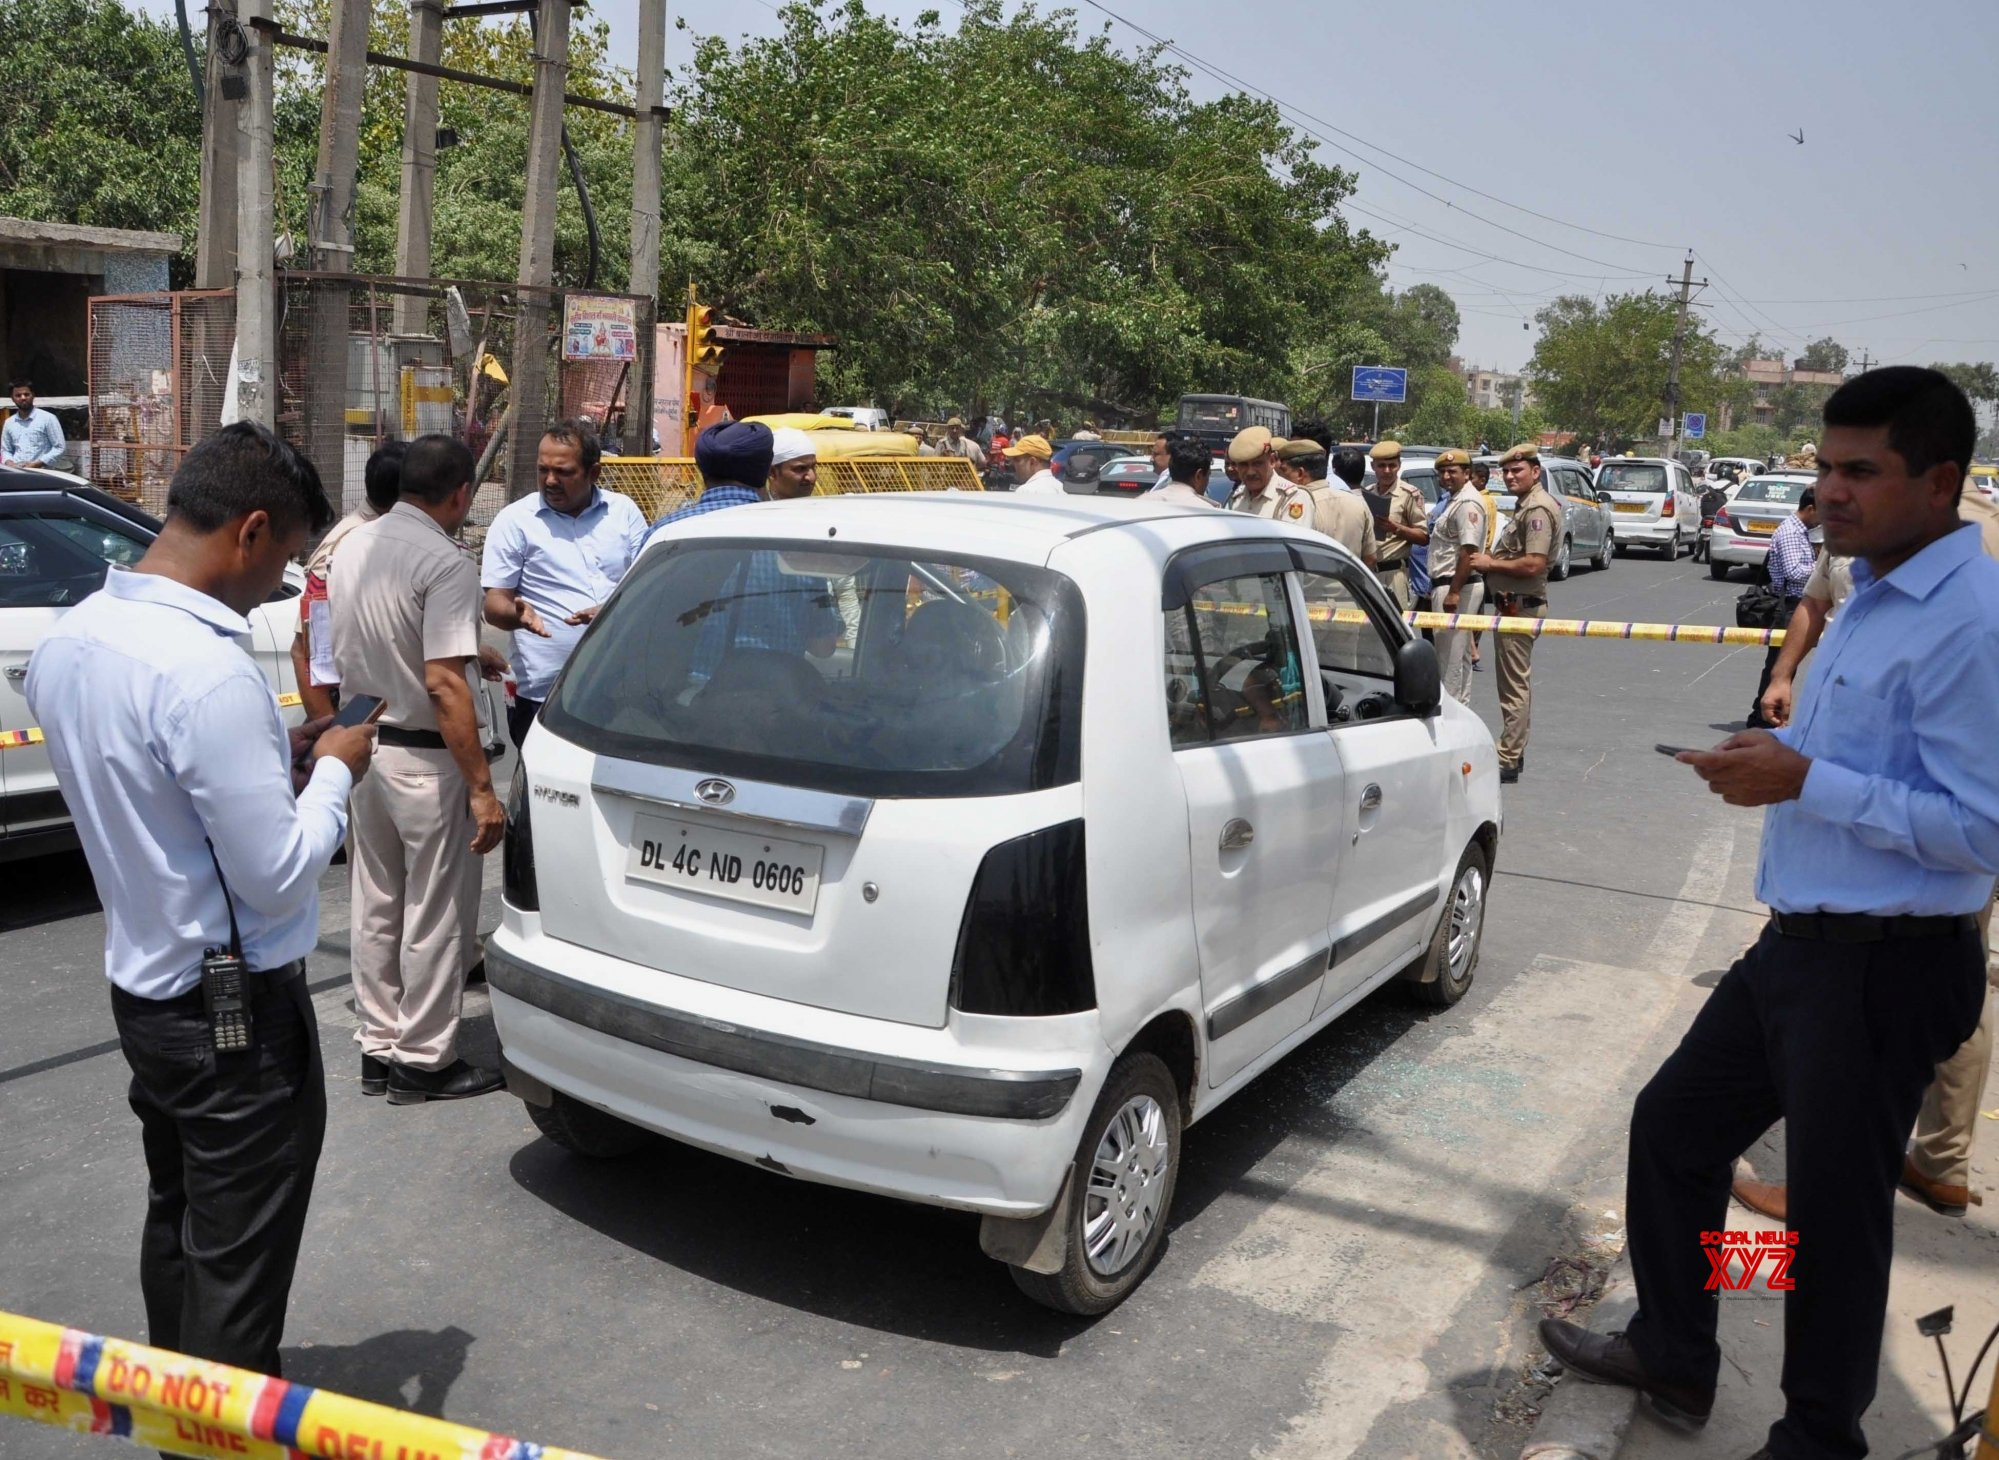 New Delhi: Criminal, associate shot dead in Delhi #Gallery